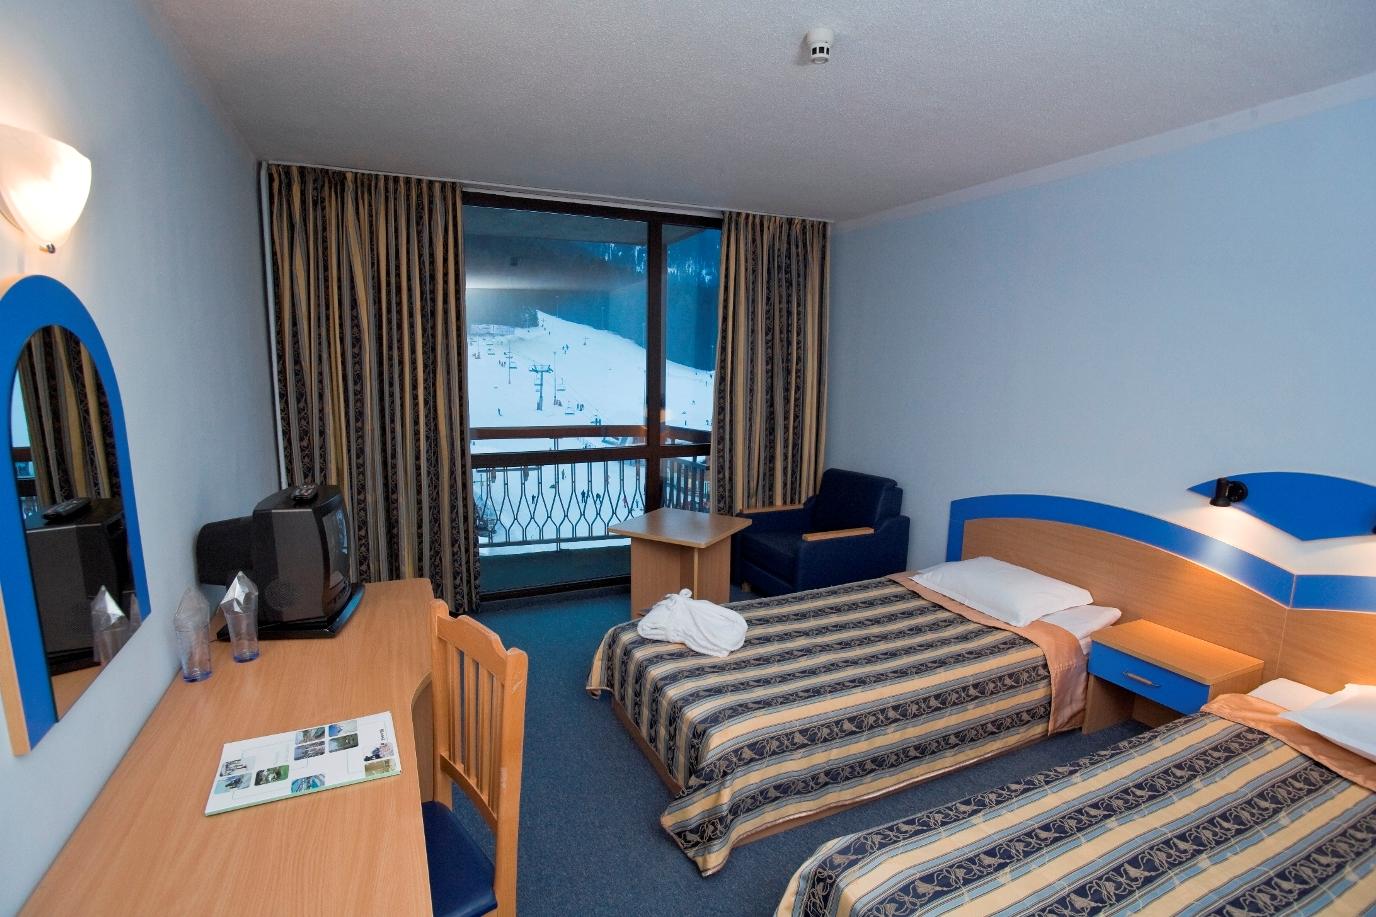 Hotel_Rila_Double_Room_View